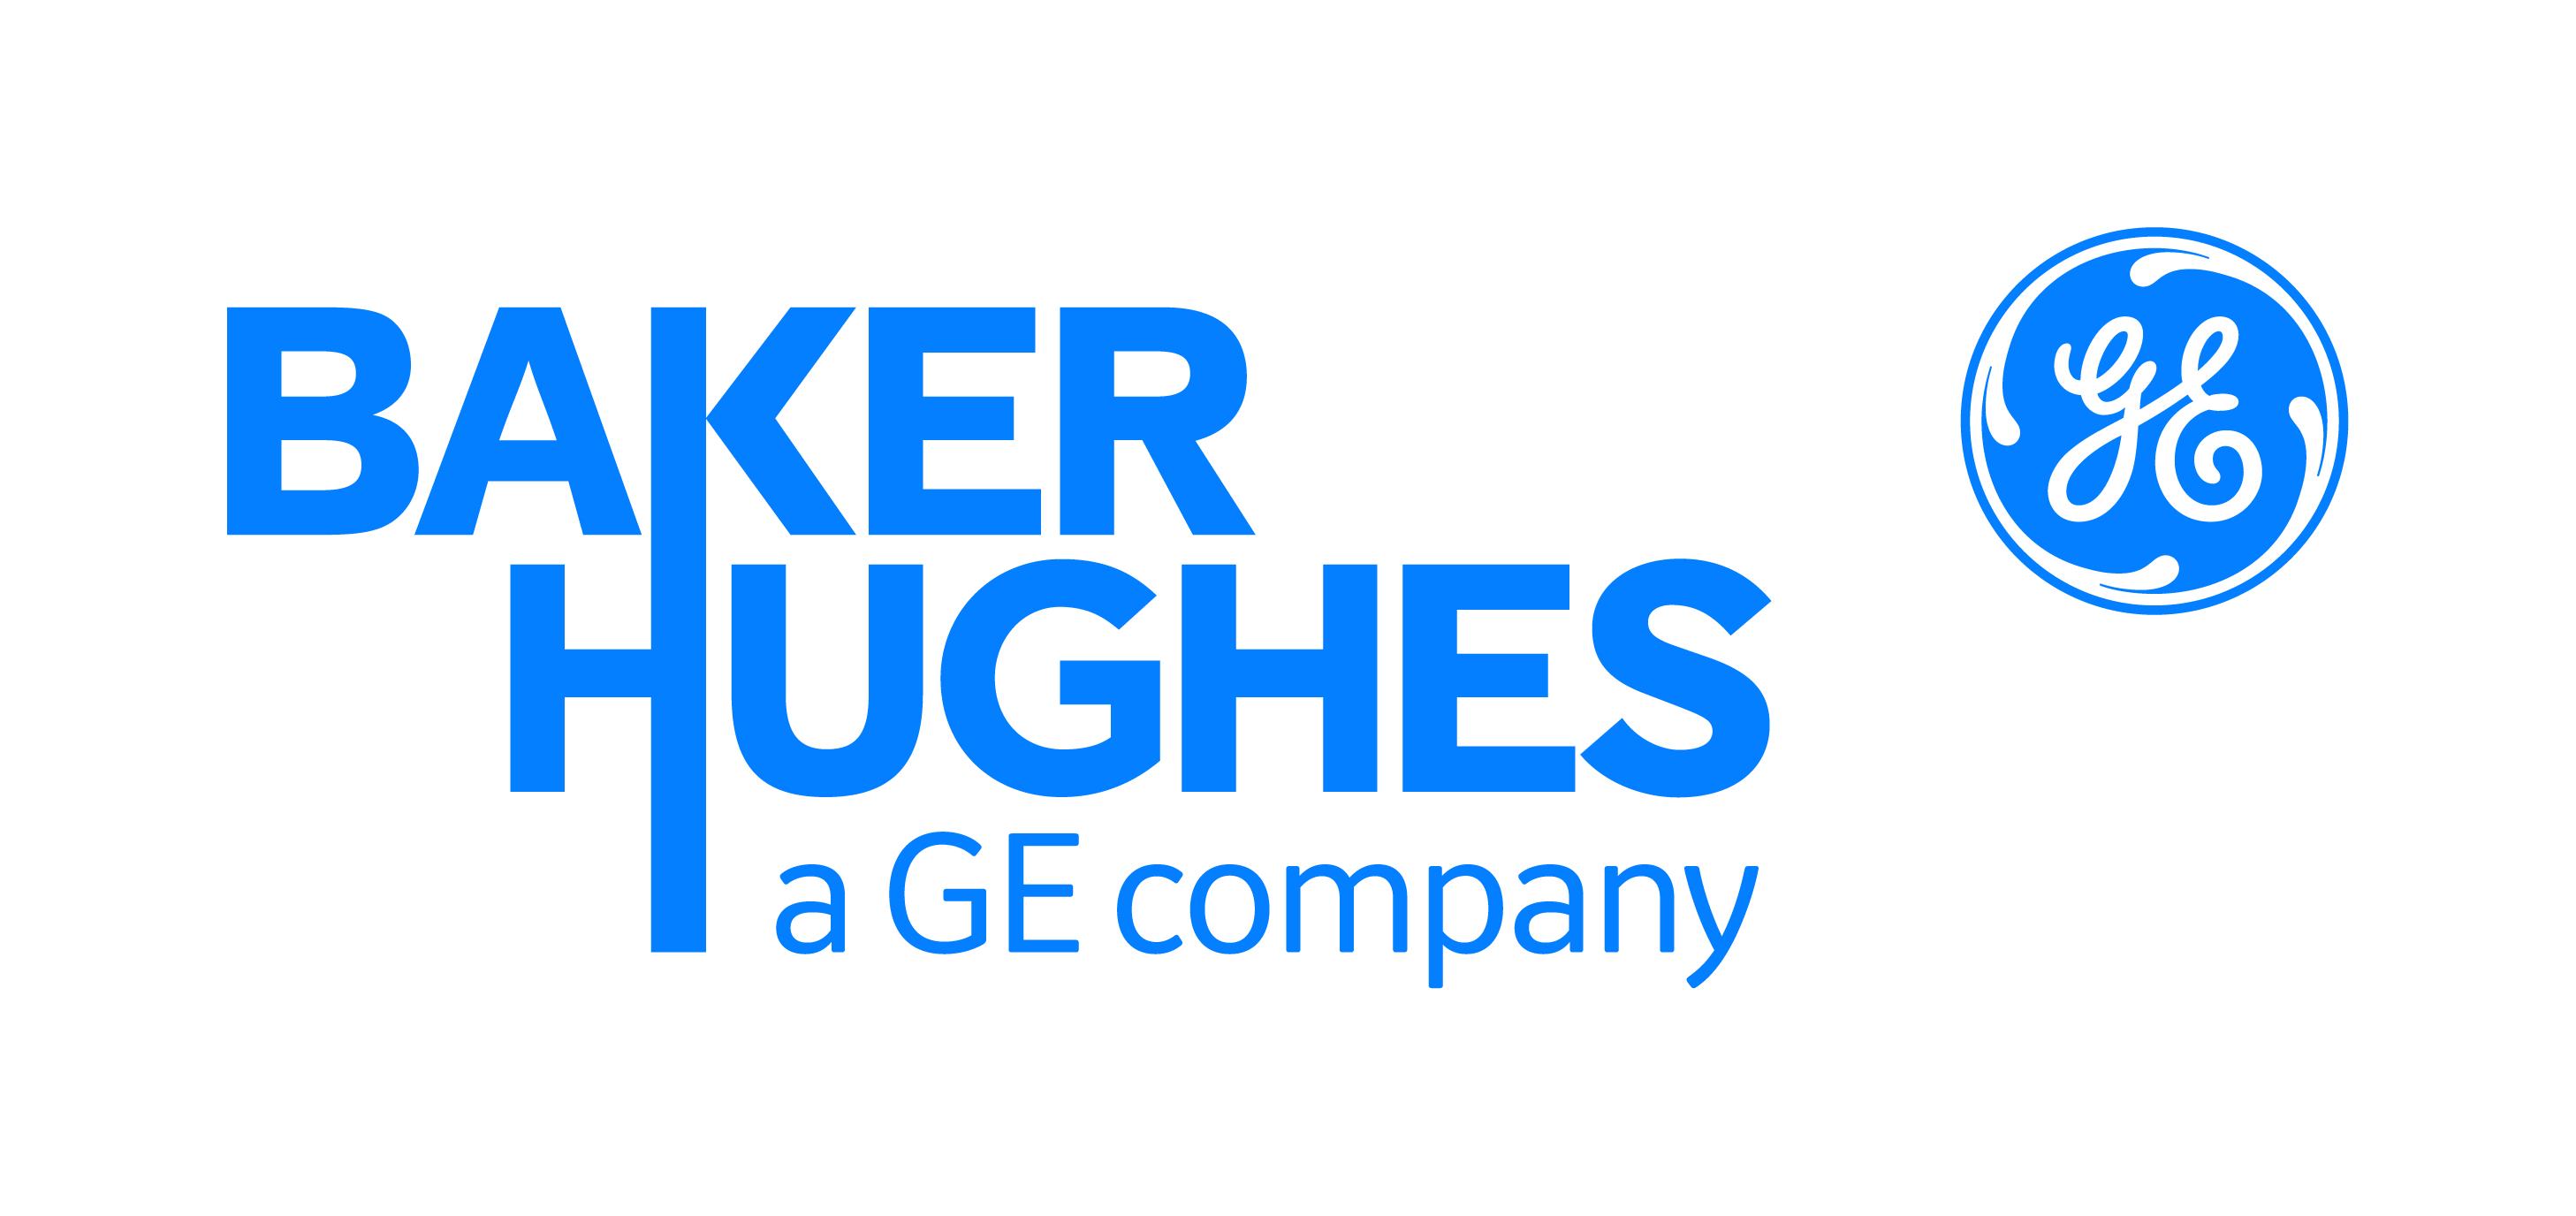 Baker Hughes bhge_lg_blu_4cp_sol